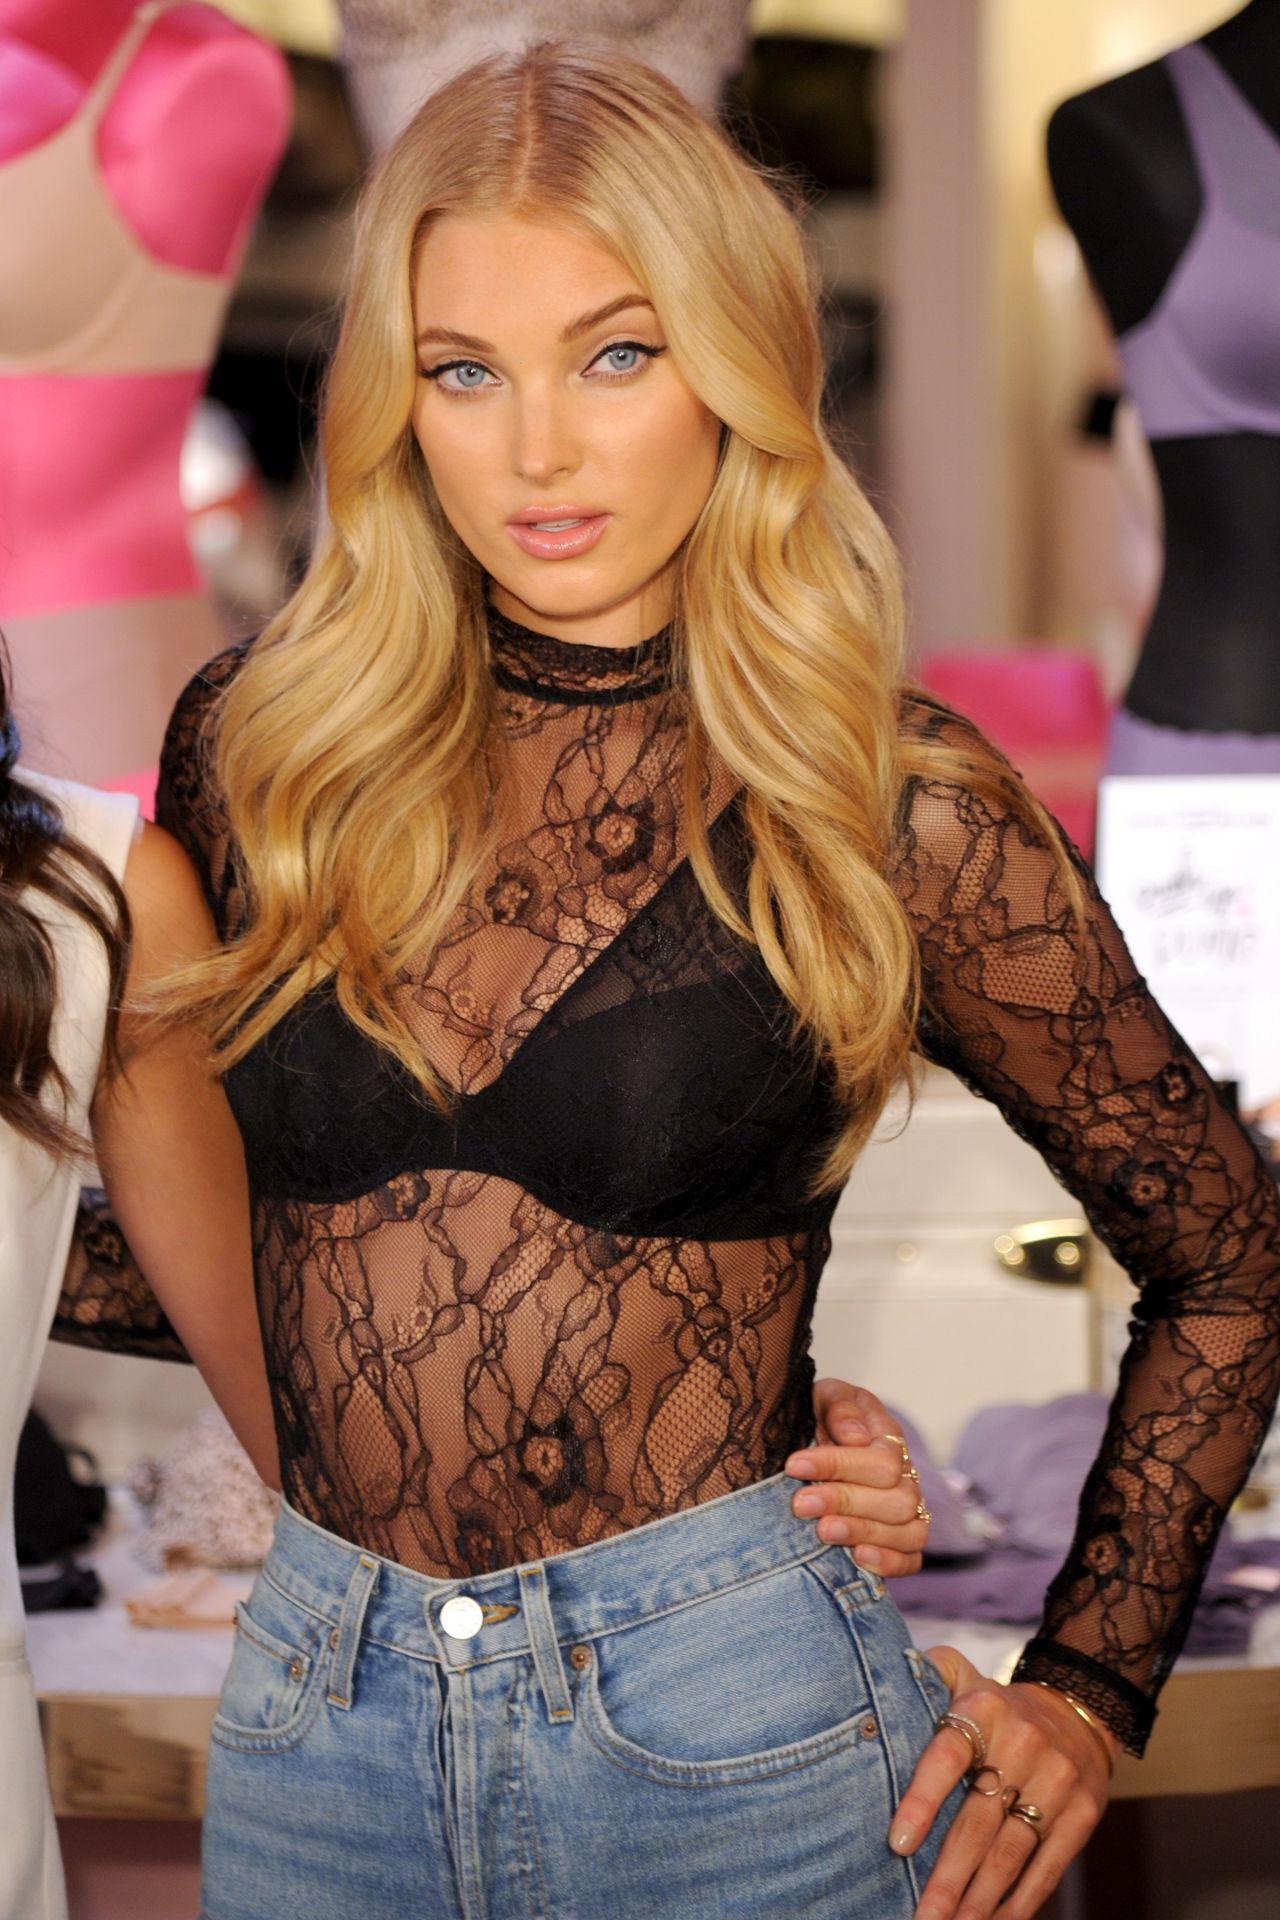 cfcaa05ed6 Elsa Hosk – Celebrate the Victoria s Secret T-Shirt Bra at Victoria s  Secret in NYC 07 18 2017